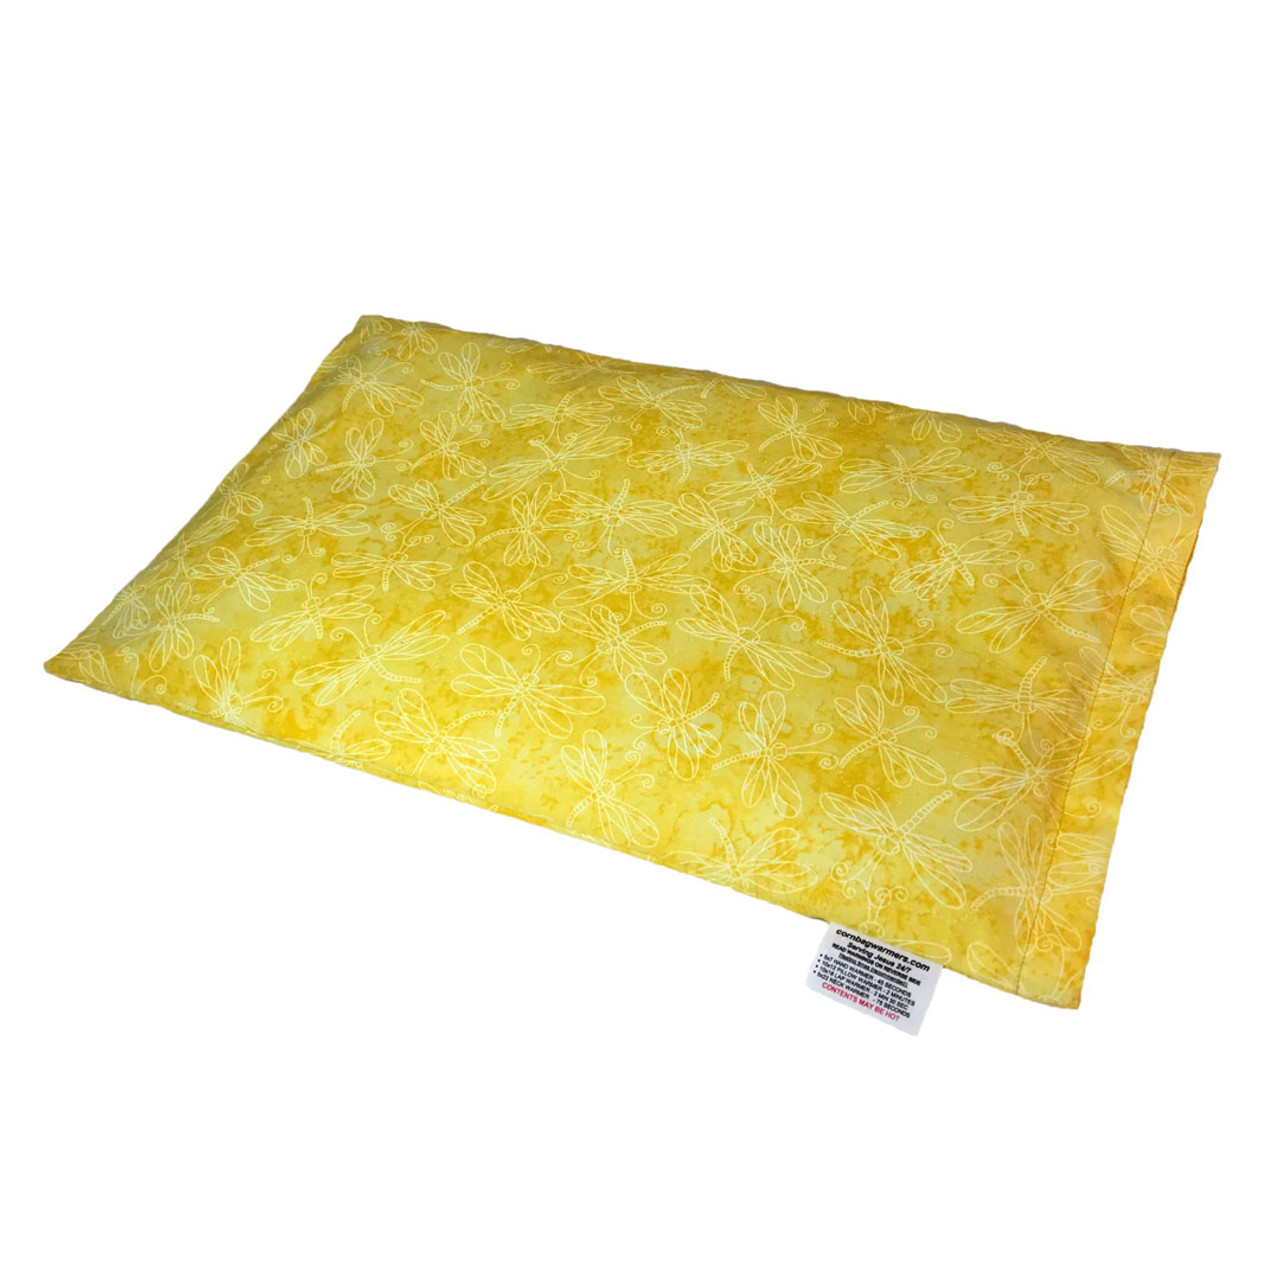 Golden Dragonflies Lap Cornbag Warmer - Corn Filled Microwave Heating Pad